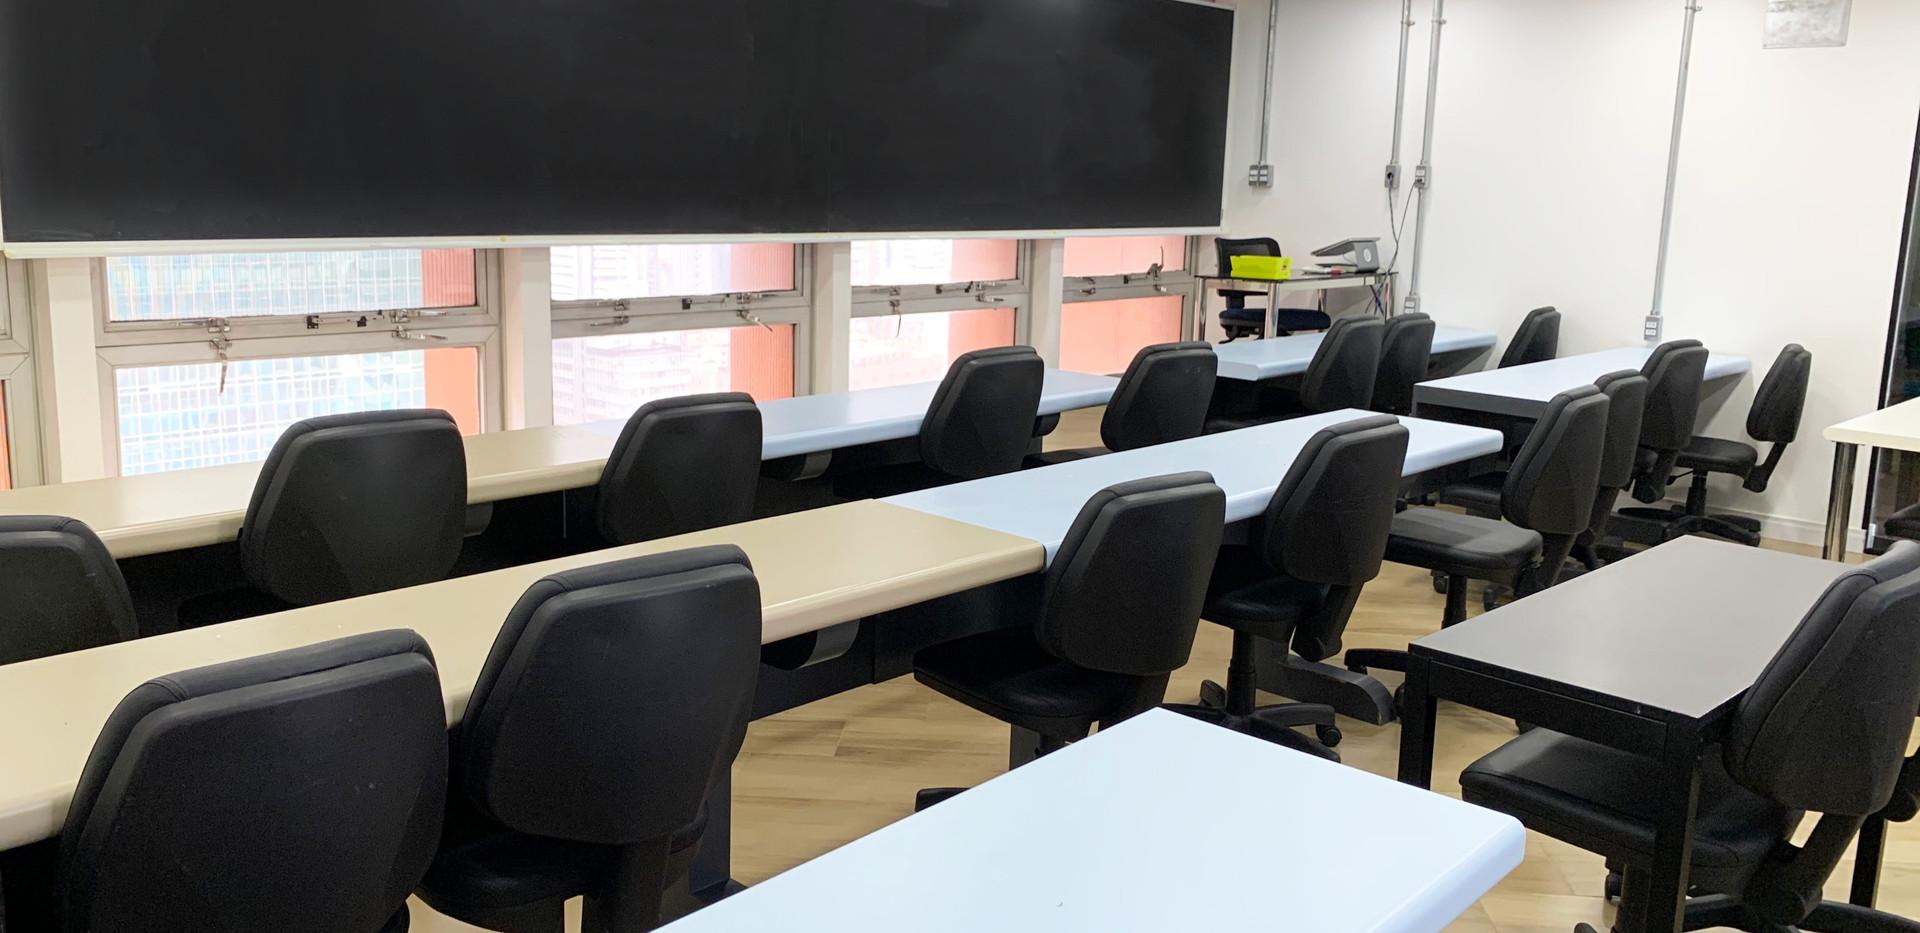 Sala de aula B